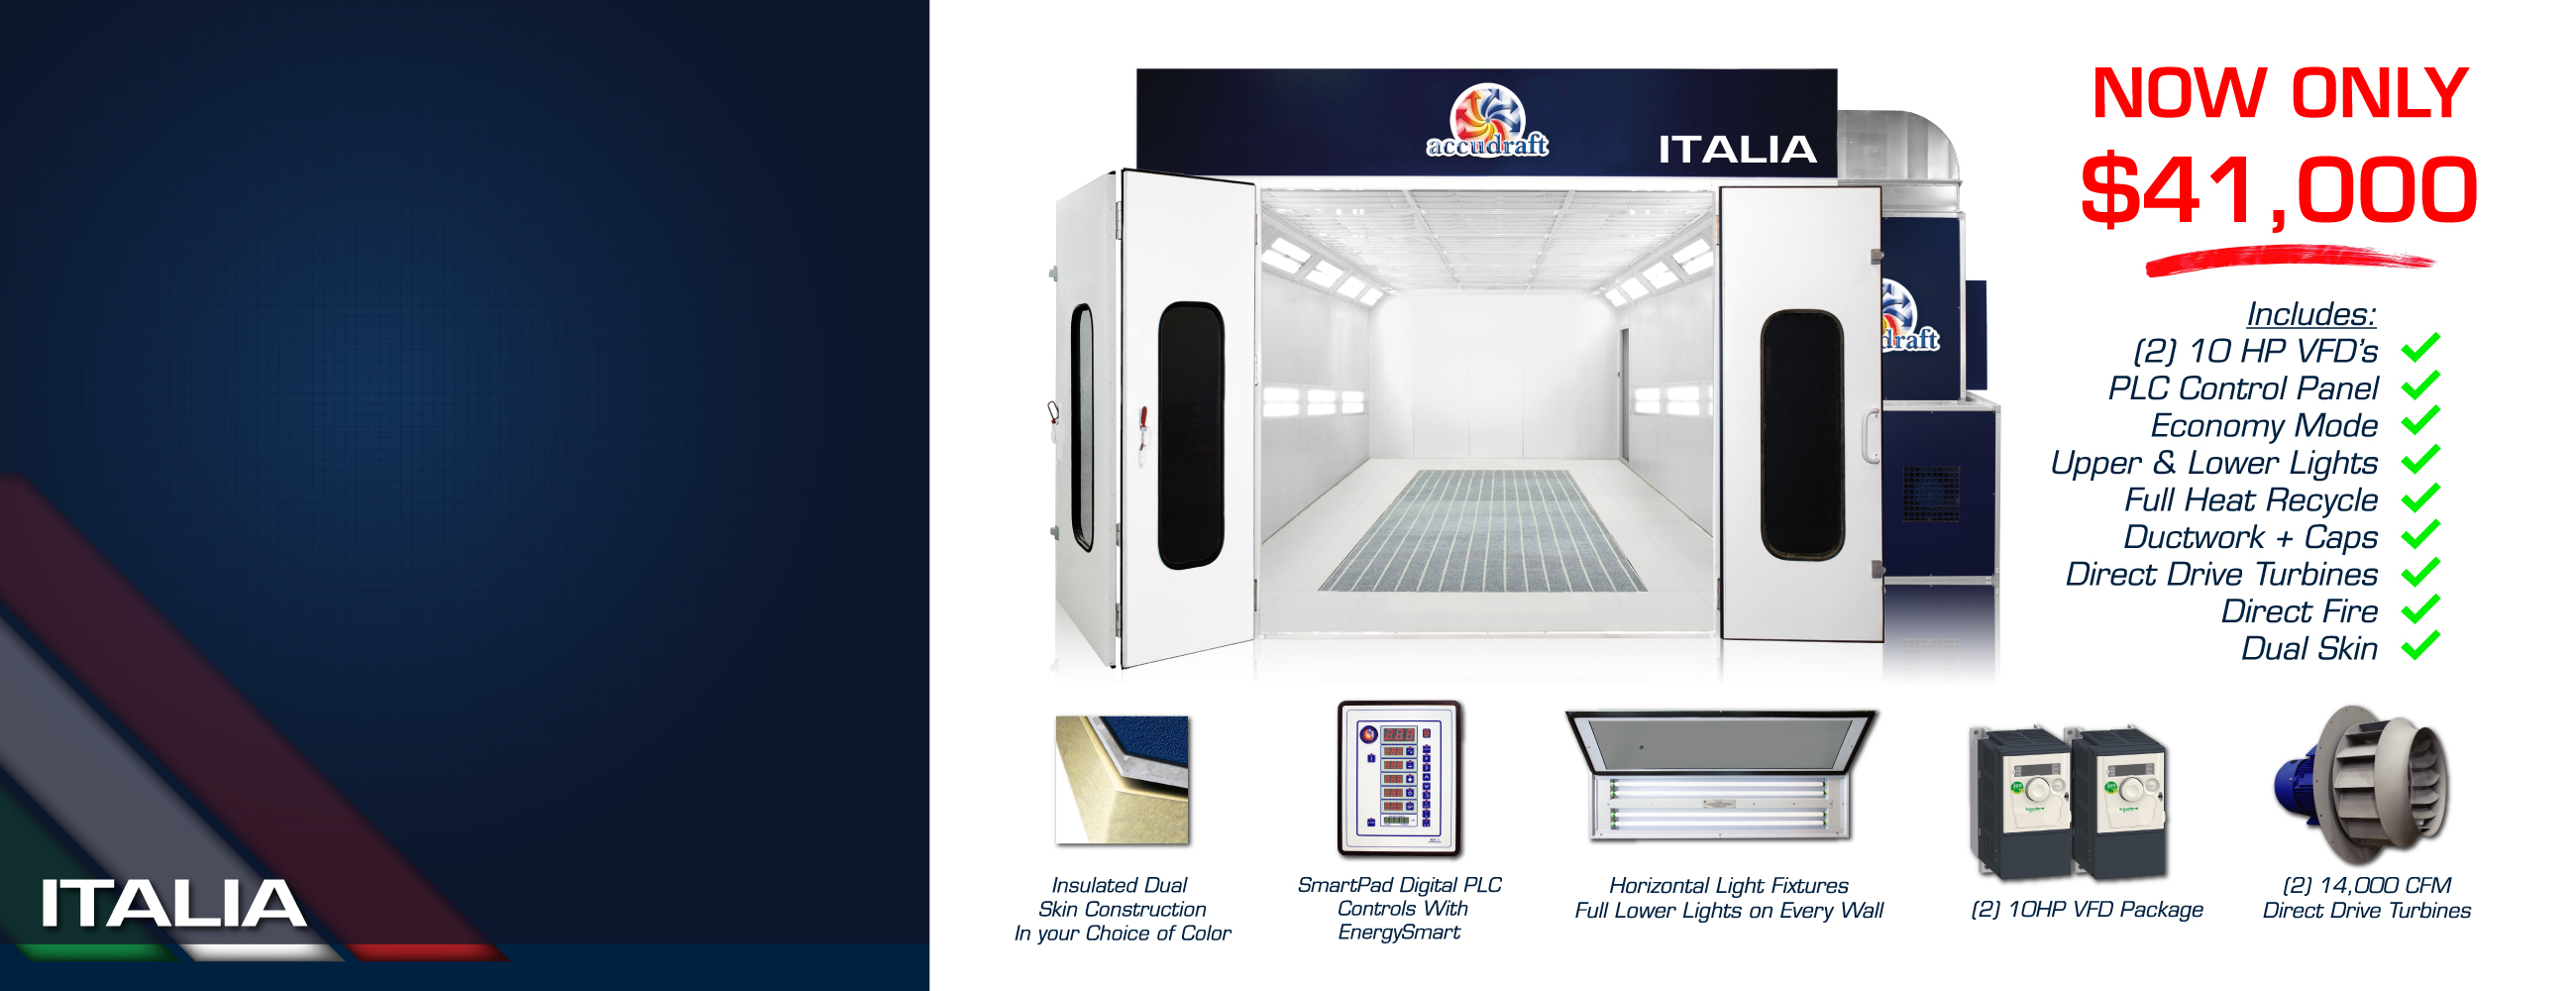 Italia Downdraft Paint Booth 41,000 Dollars